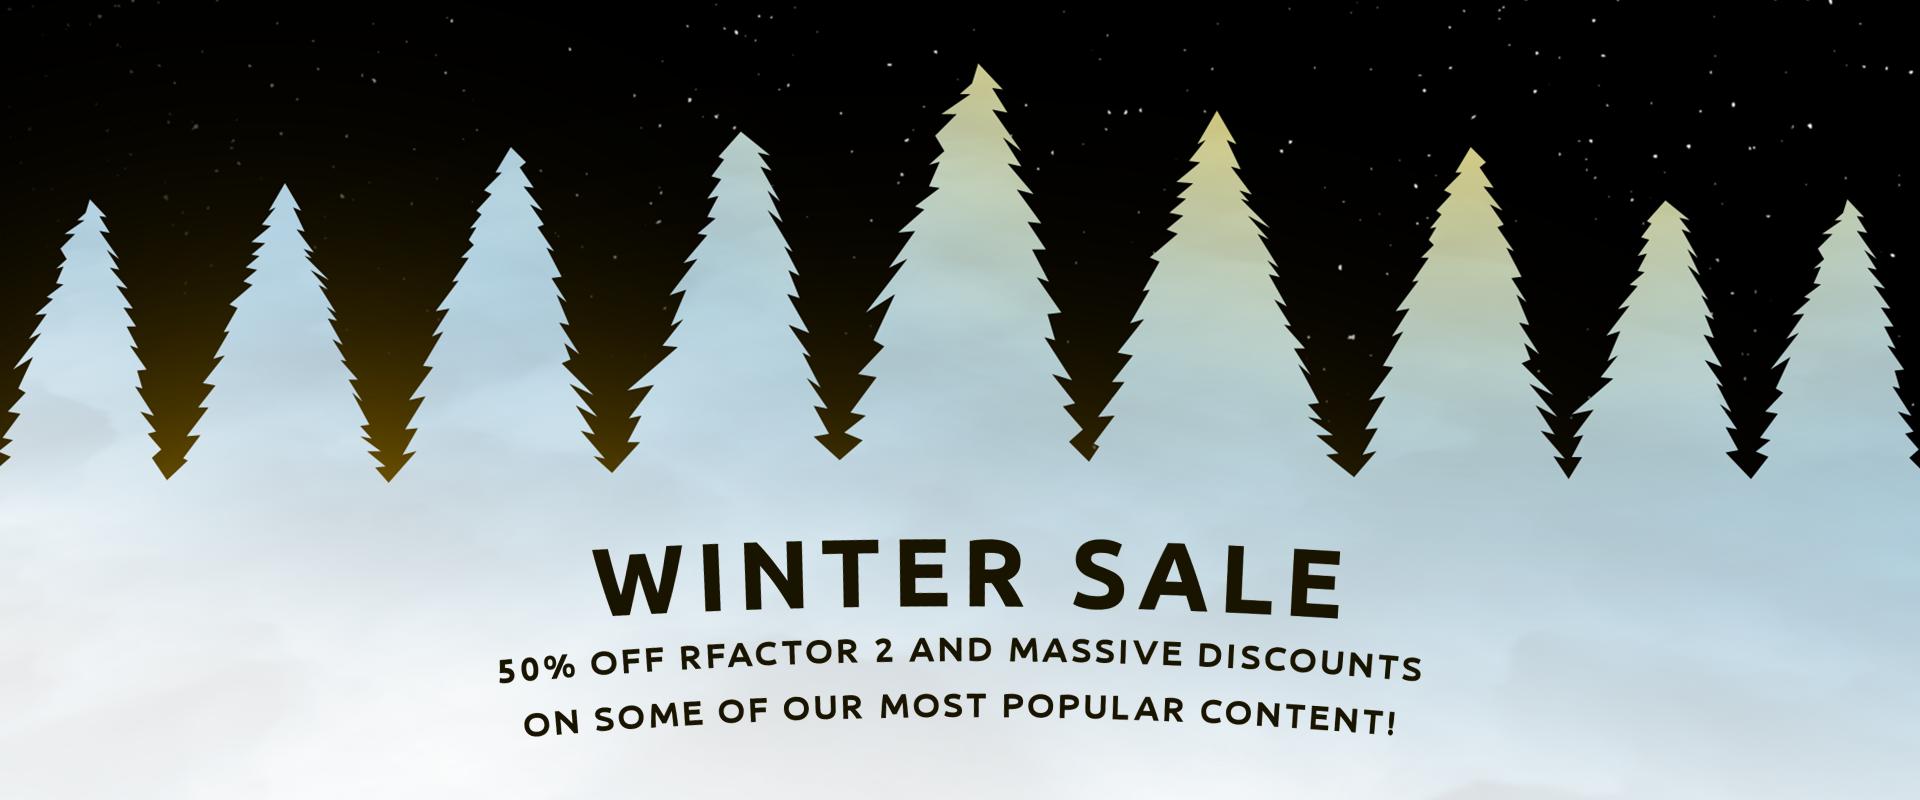 winter_sale_2019_header_wordpress.png